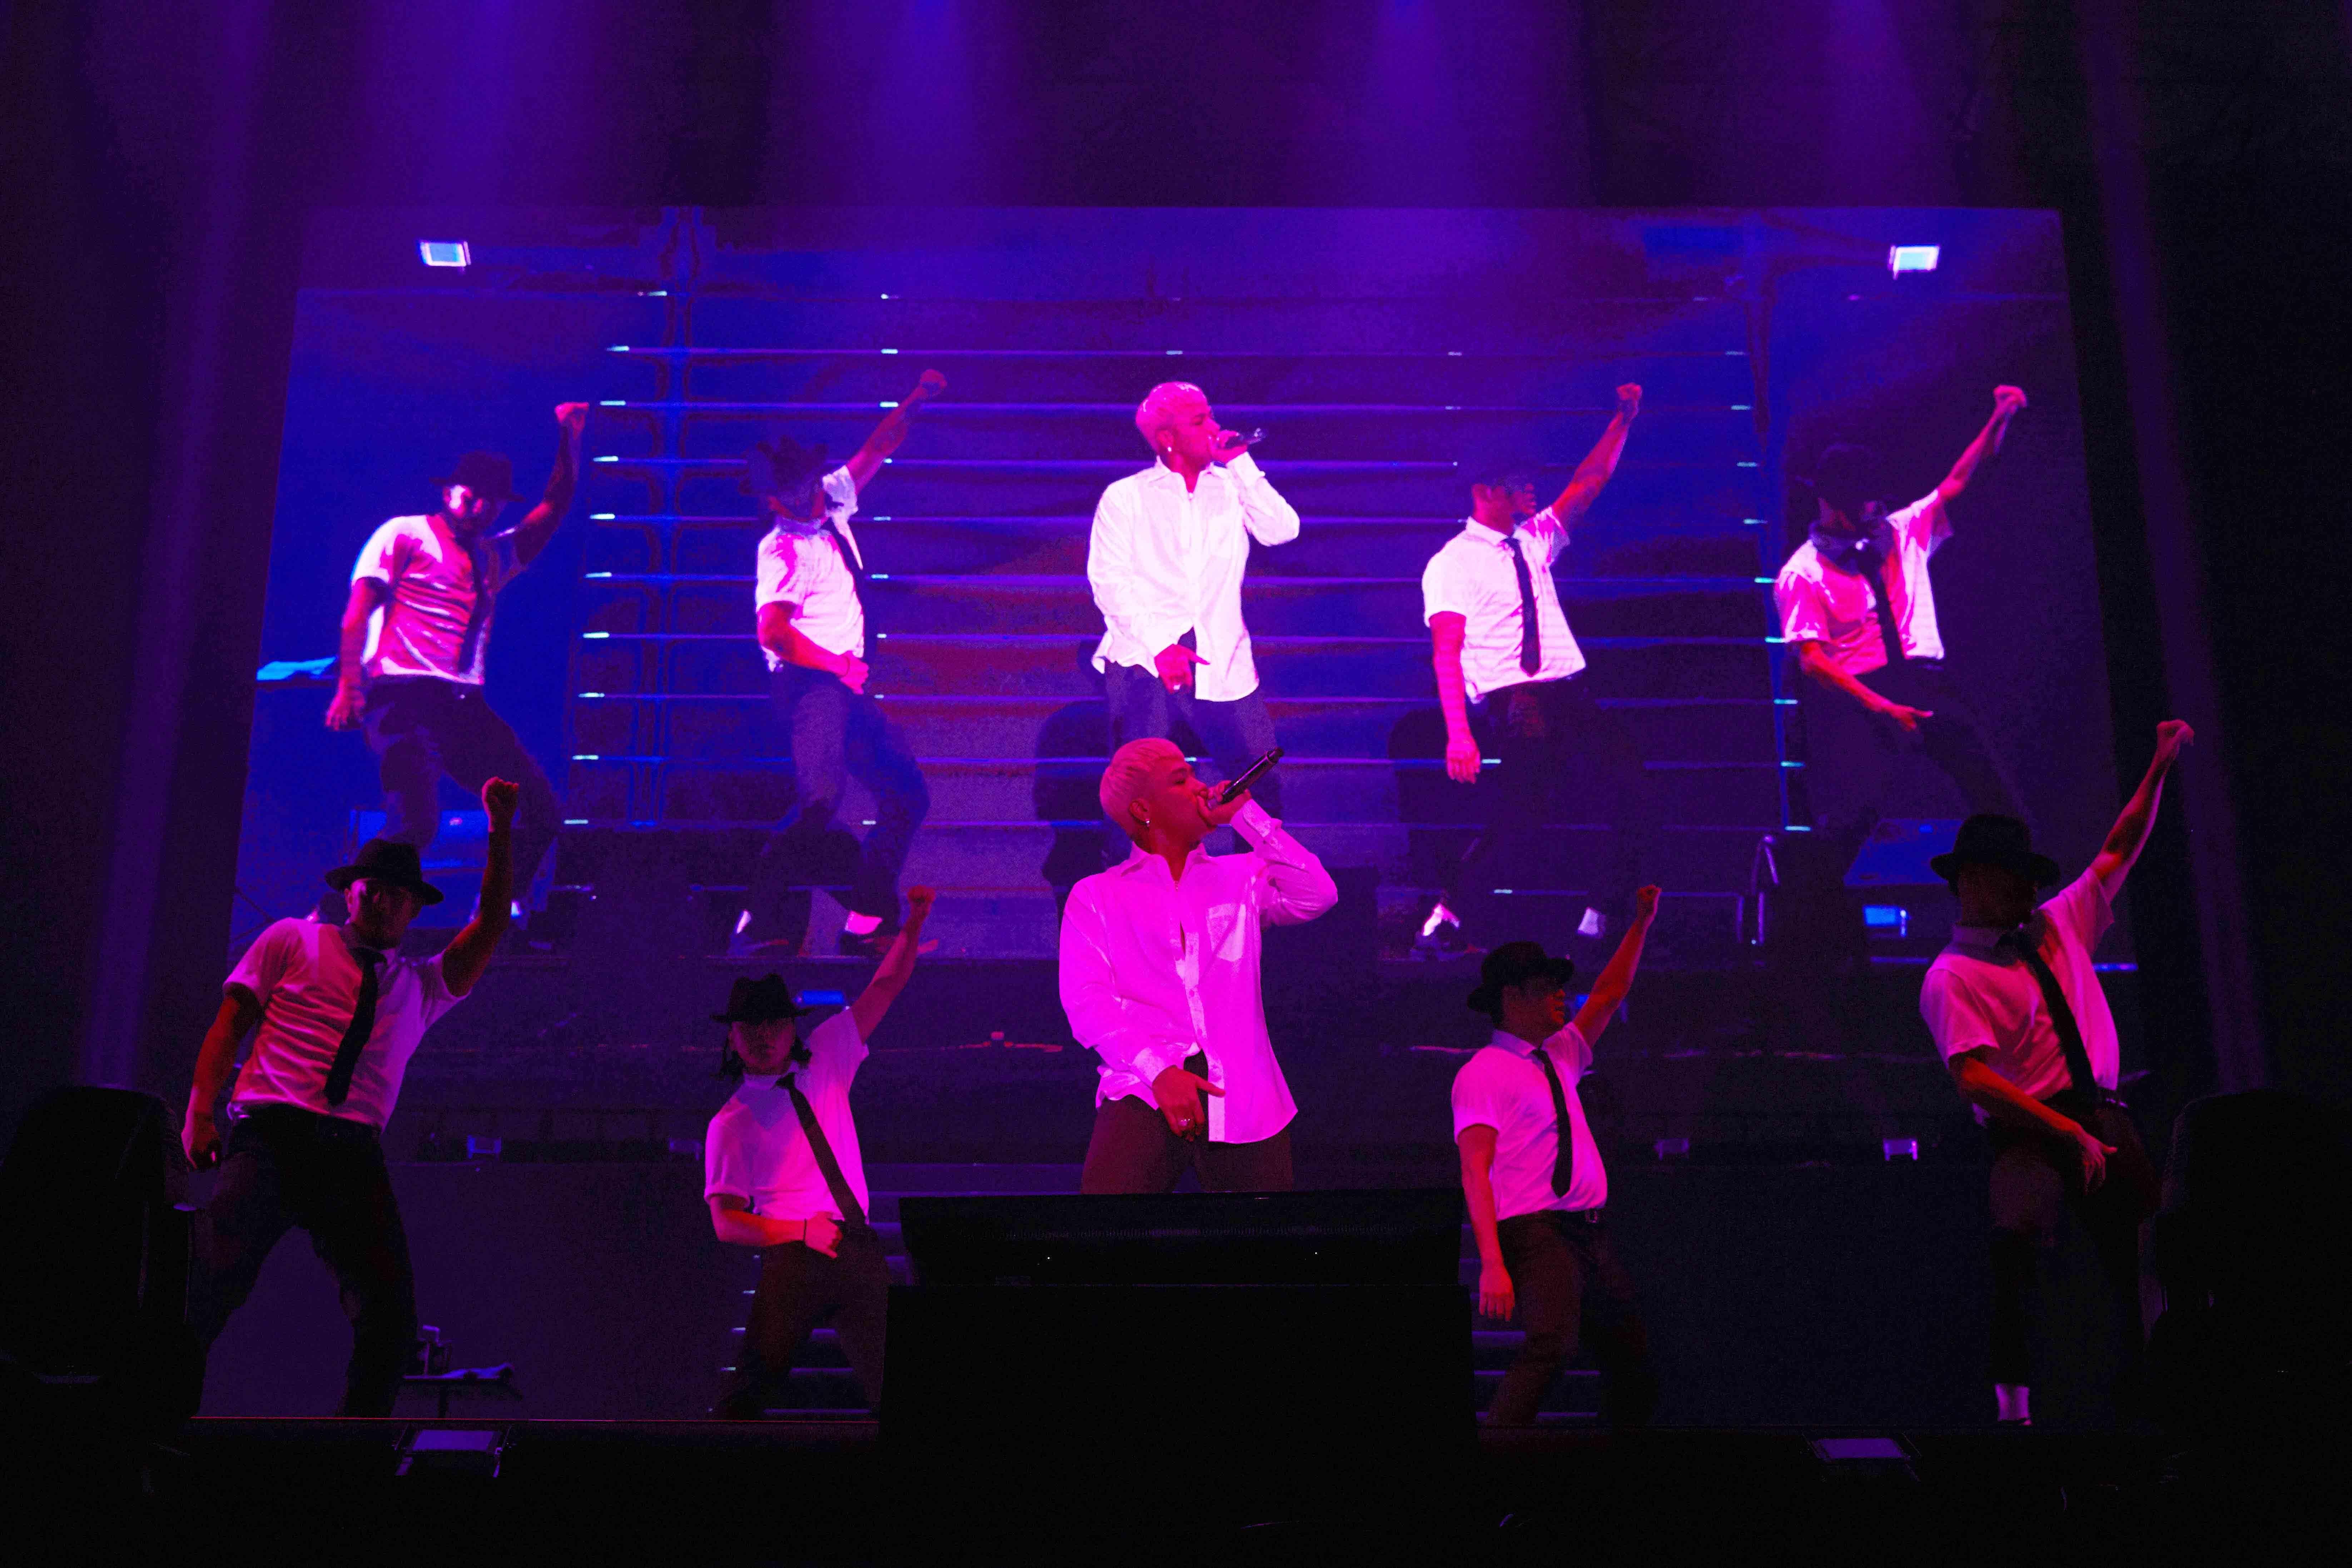 『HIROOMI TOSAKA 台北演唱會 2019 SUPERMOON ~UNDER THE MOONLIGHT~』